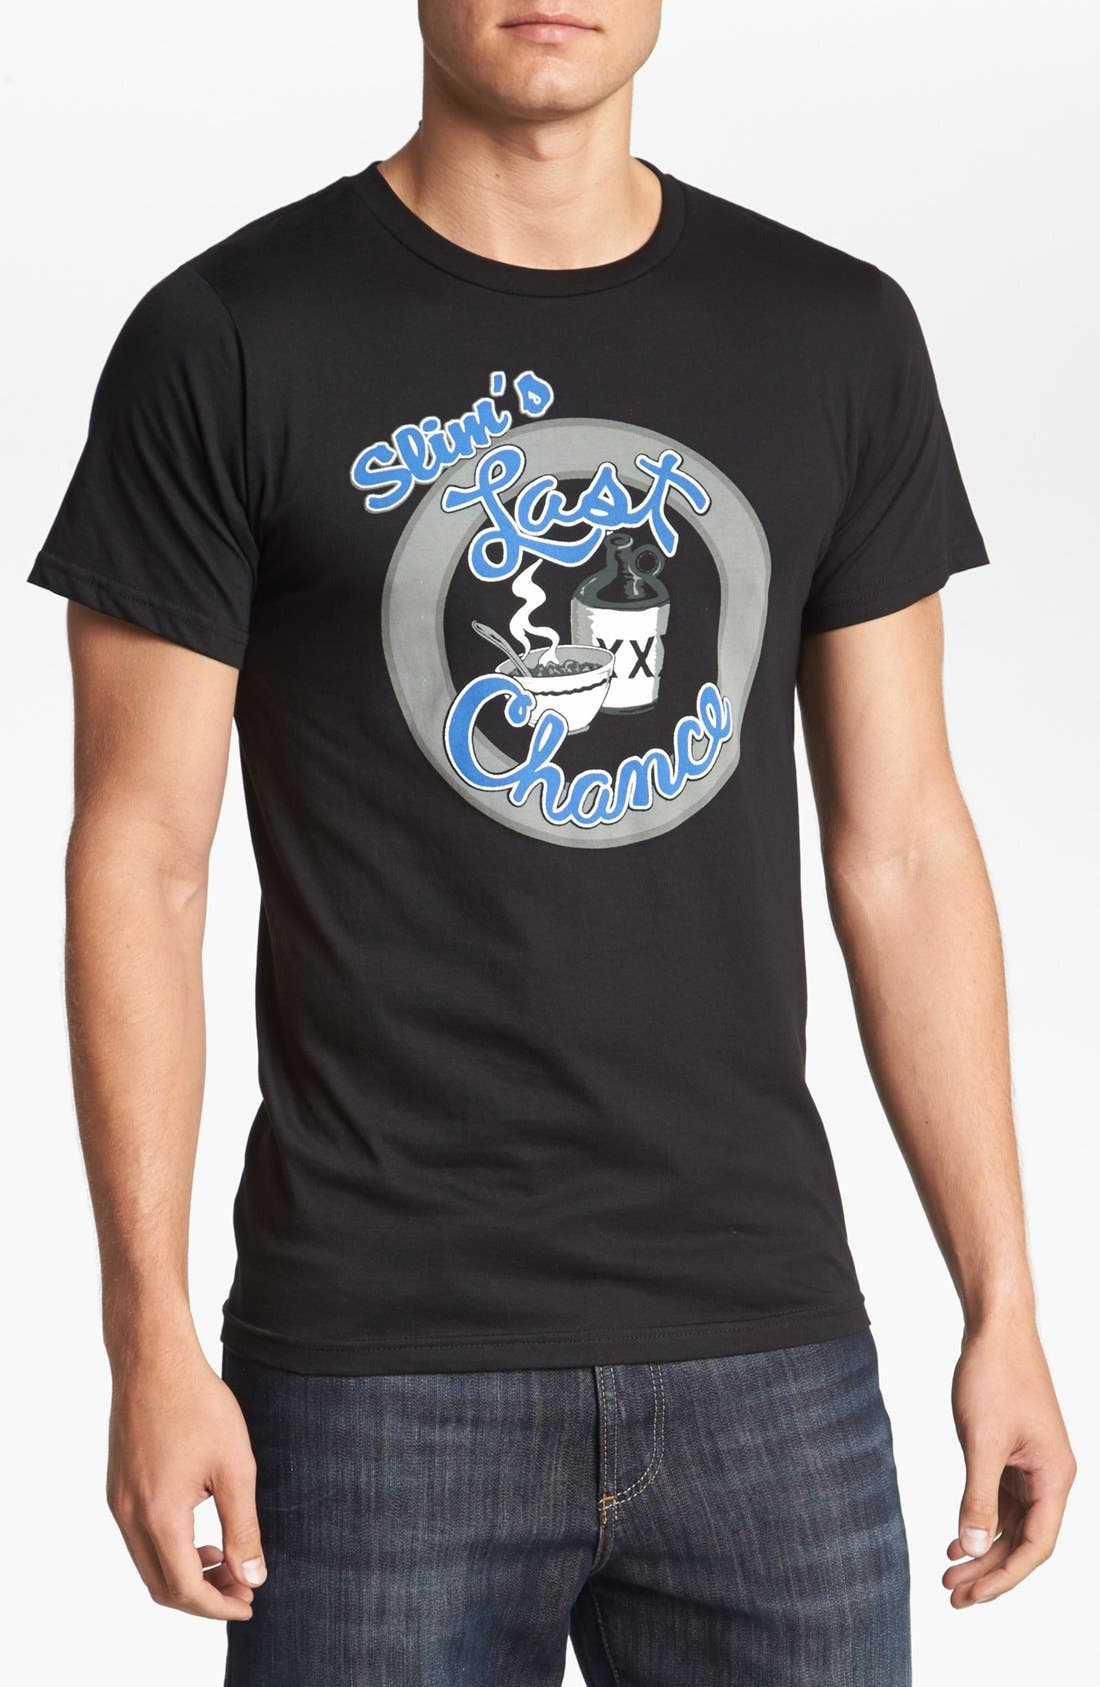 Main Image - Horses Cut Shop 'Slim's Last Chance' T-Shirt